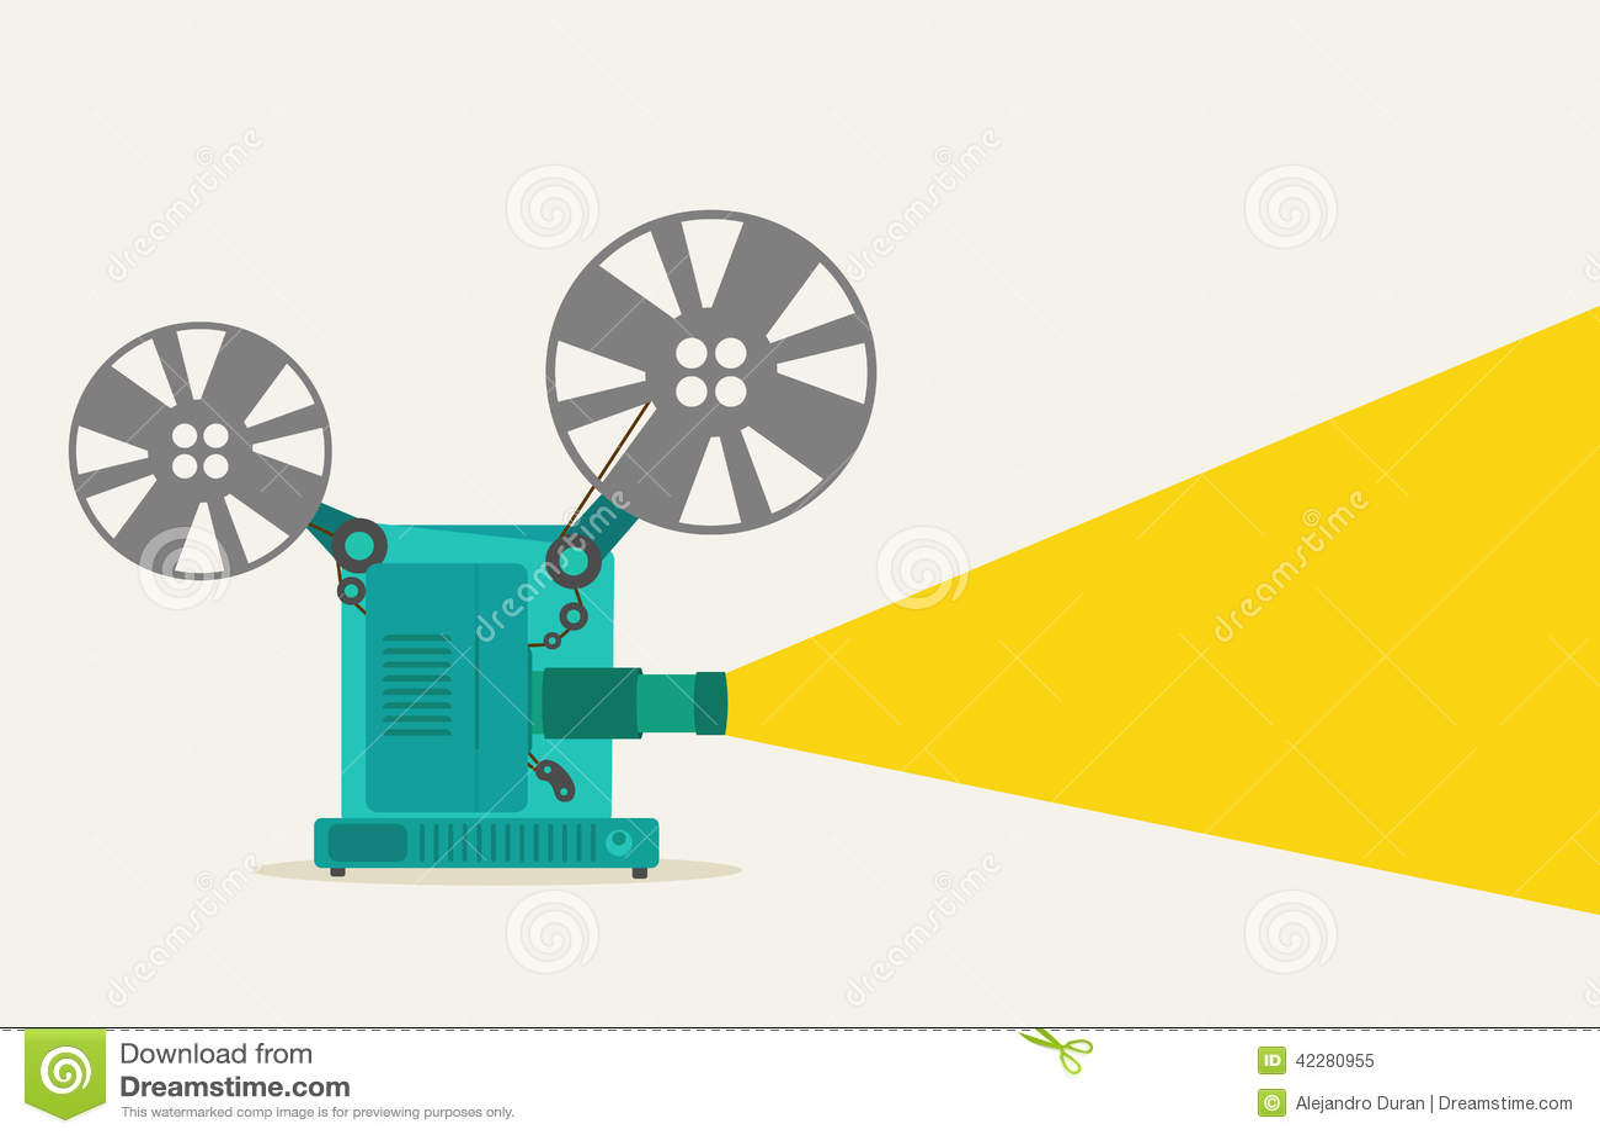 Vintage Movie Projector Stock Vector - Image: 42280955